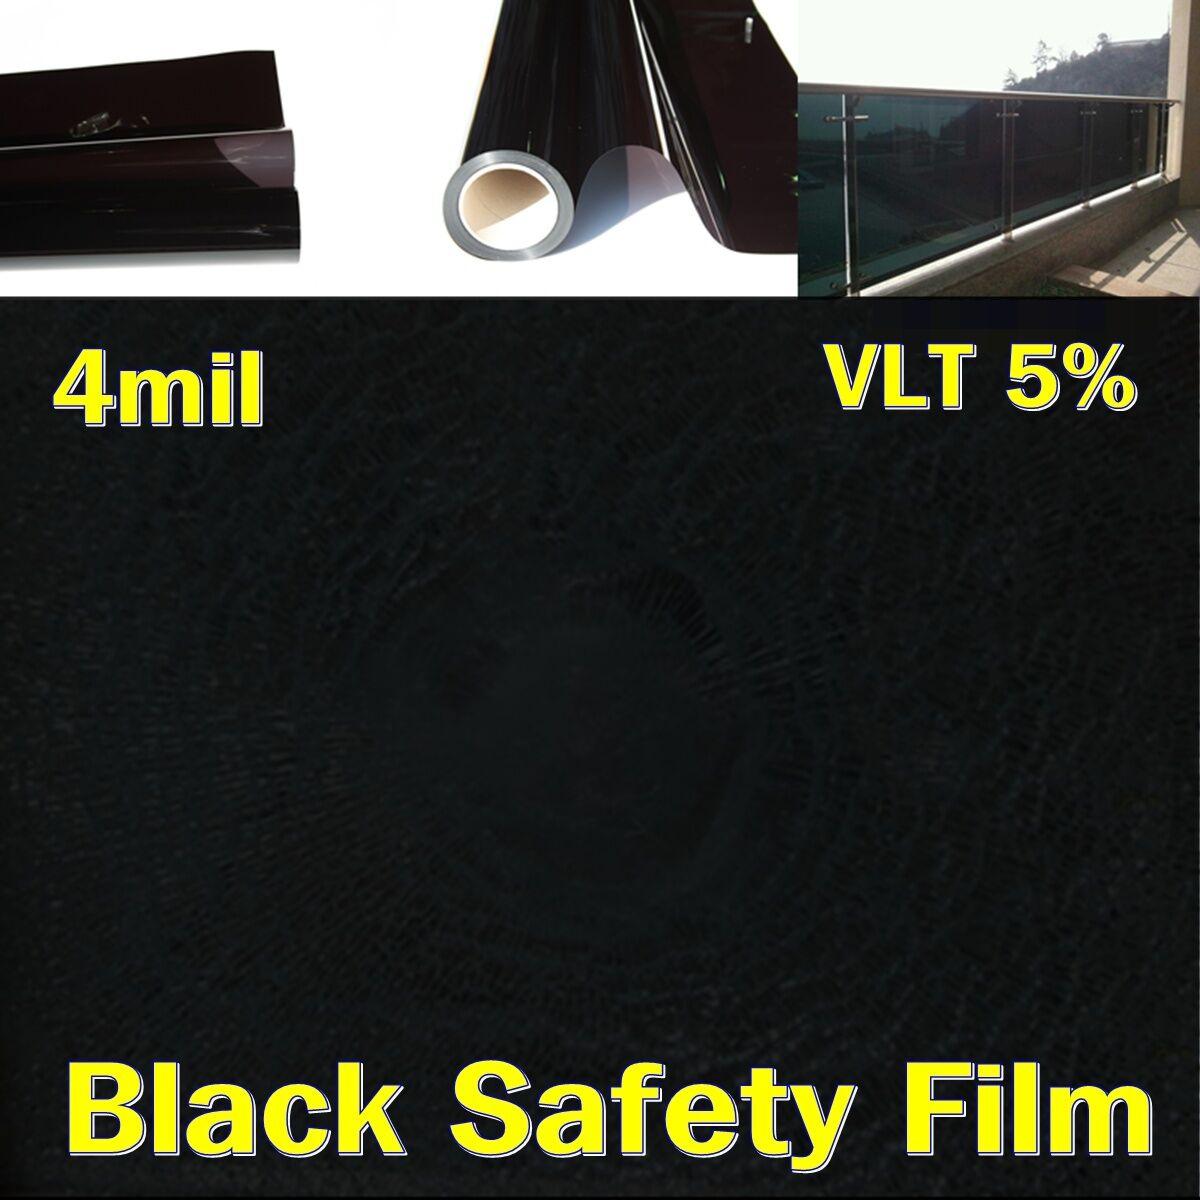 Amplia 20   (50cm) vlt5%   seguridad 4mil Negro film window security   residential uv roll